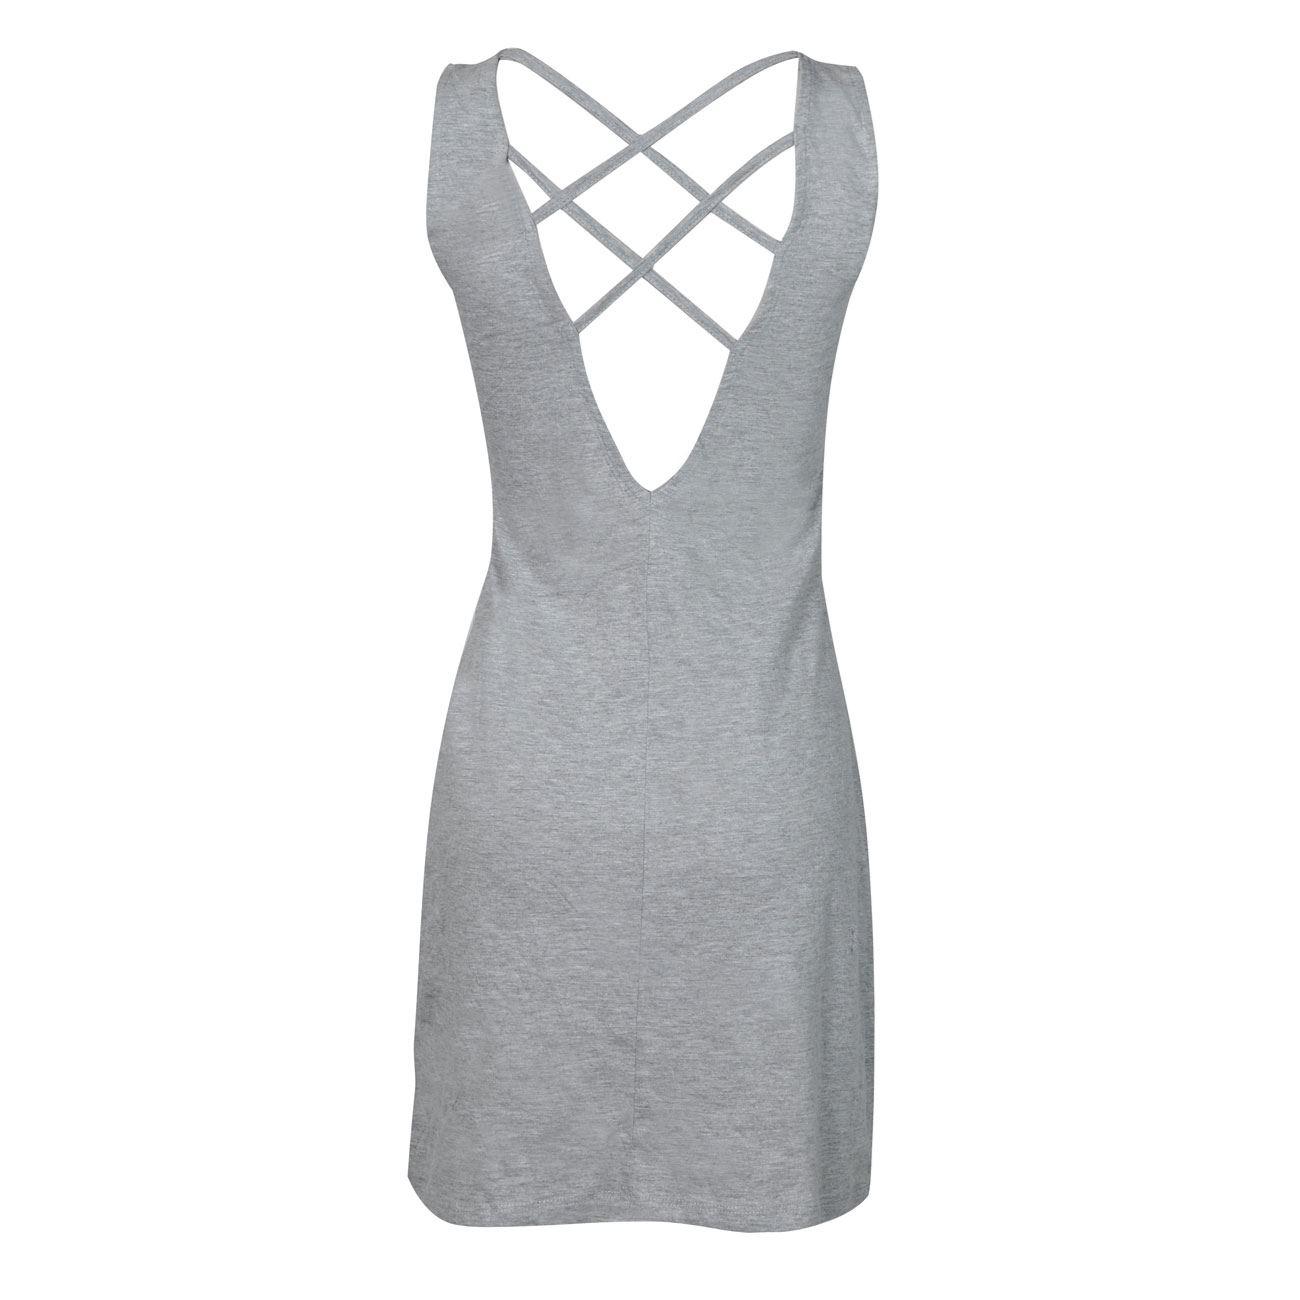 1c585b8560ce Τοποθετήστε τον κέρσορα στη φωτογραφία για μεγέθυνση. Φόρεμα Γυναικείο Γκρι  Μελανζέ Χιαστί Τύπωμα - One Size  Φόρεμα Γυναικείο Γκρι Μελανζέ ...